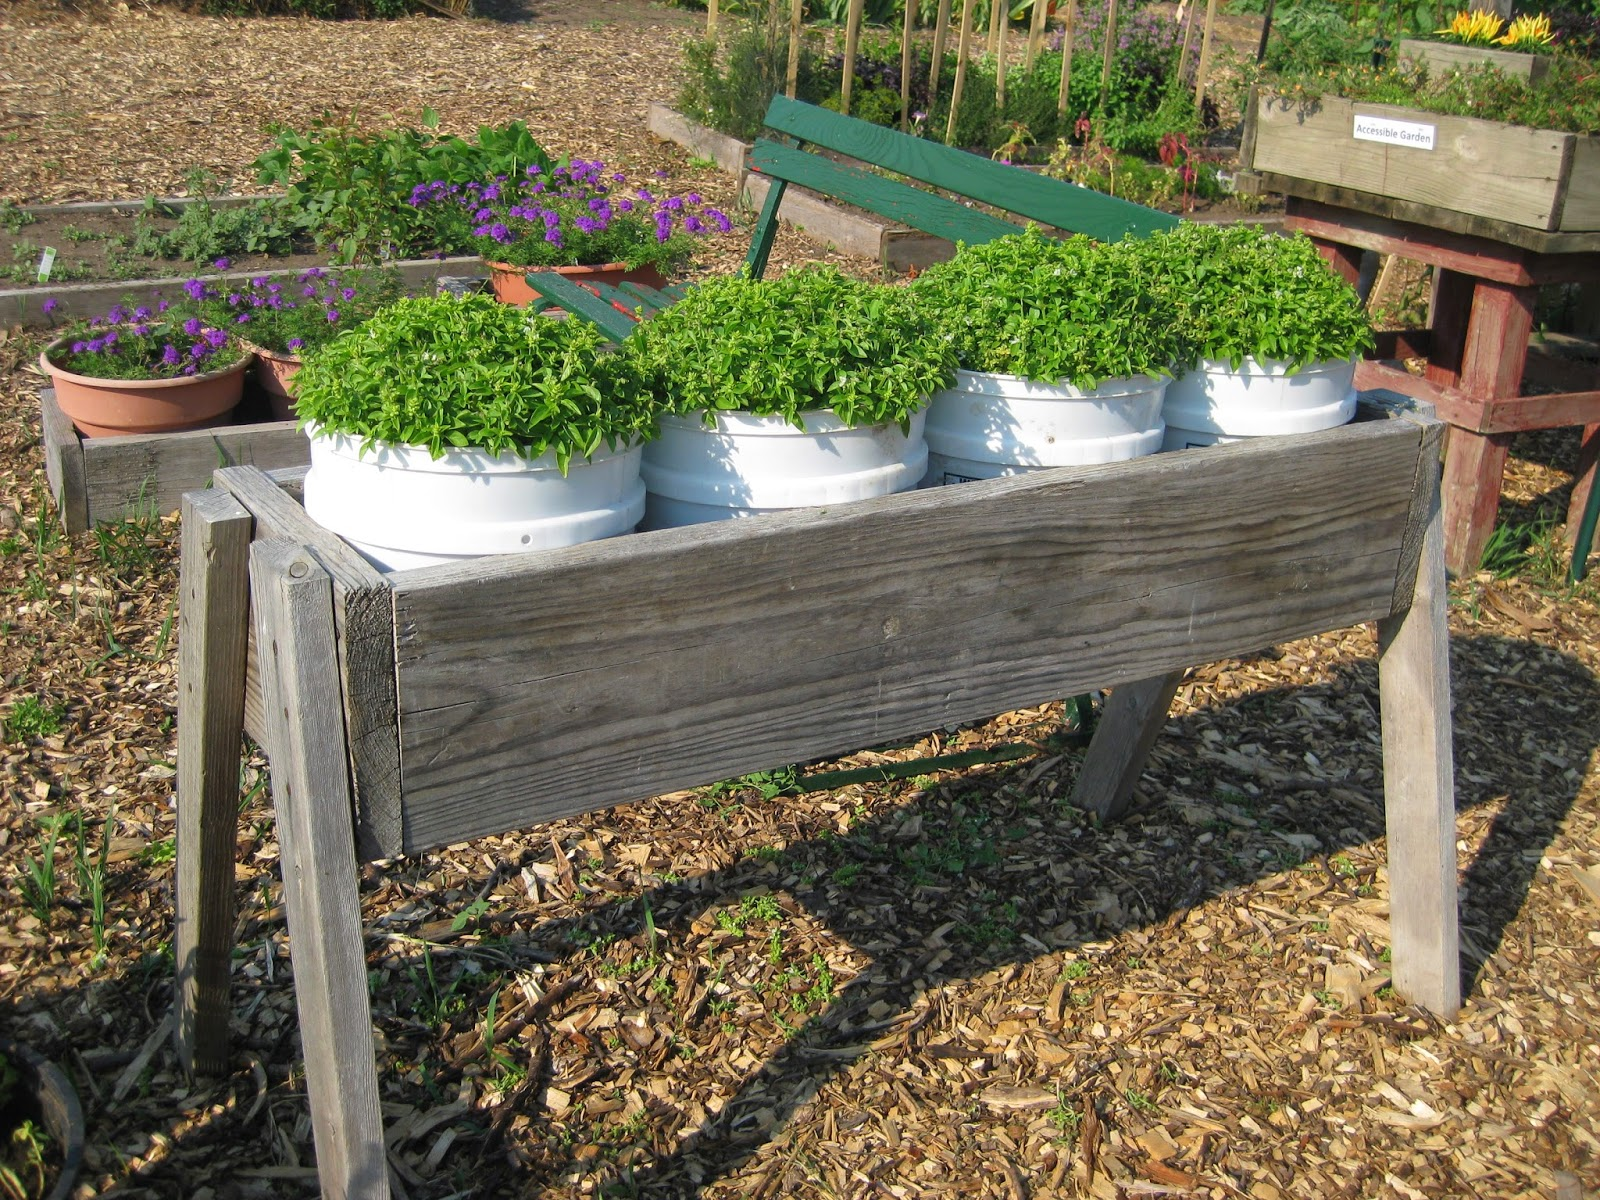 Rotary botanical gardens hort blog no stoop gardening for Gardening 5 gallon bucket